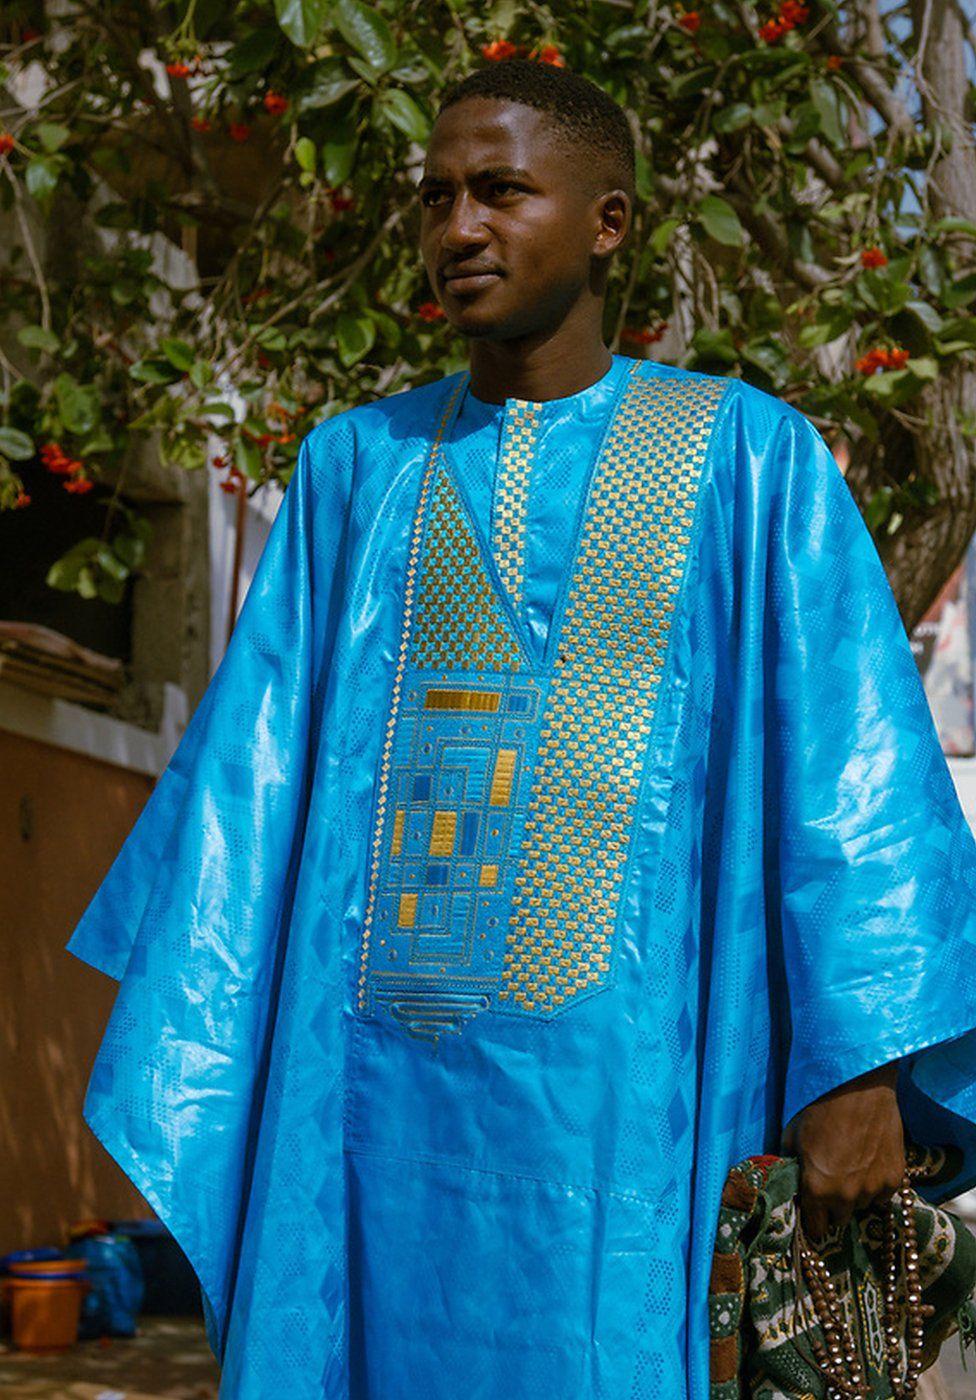 Boubacar Diallo wears a blue boubou